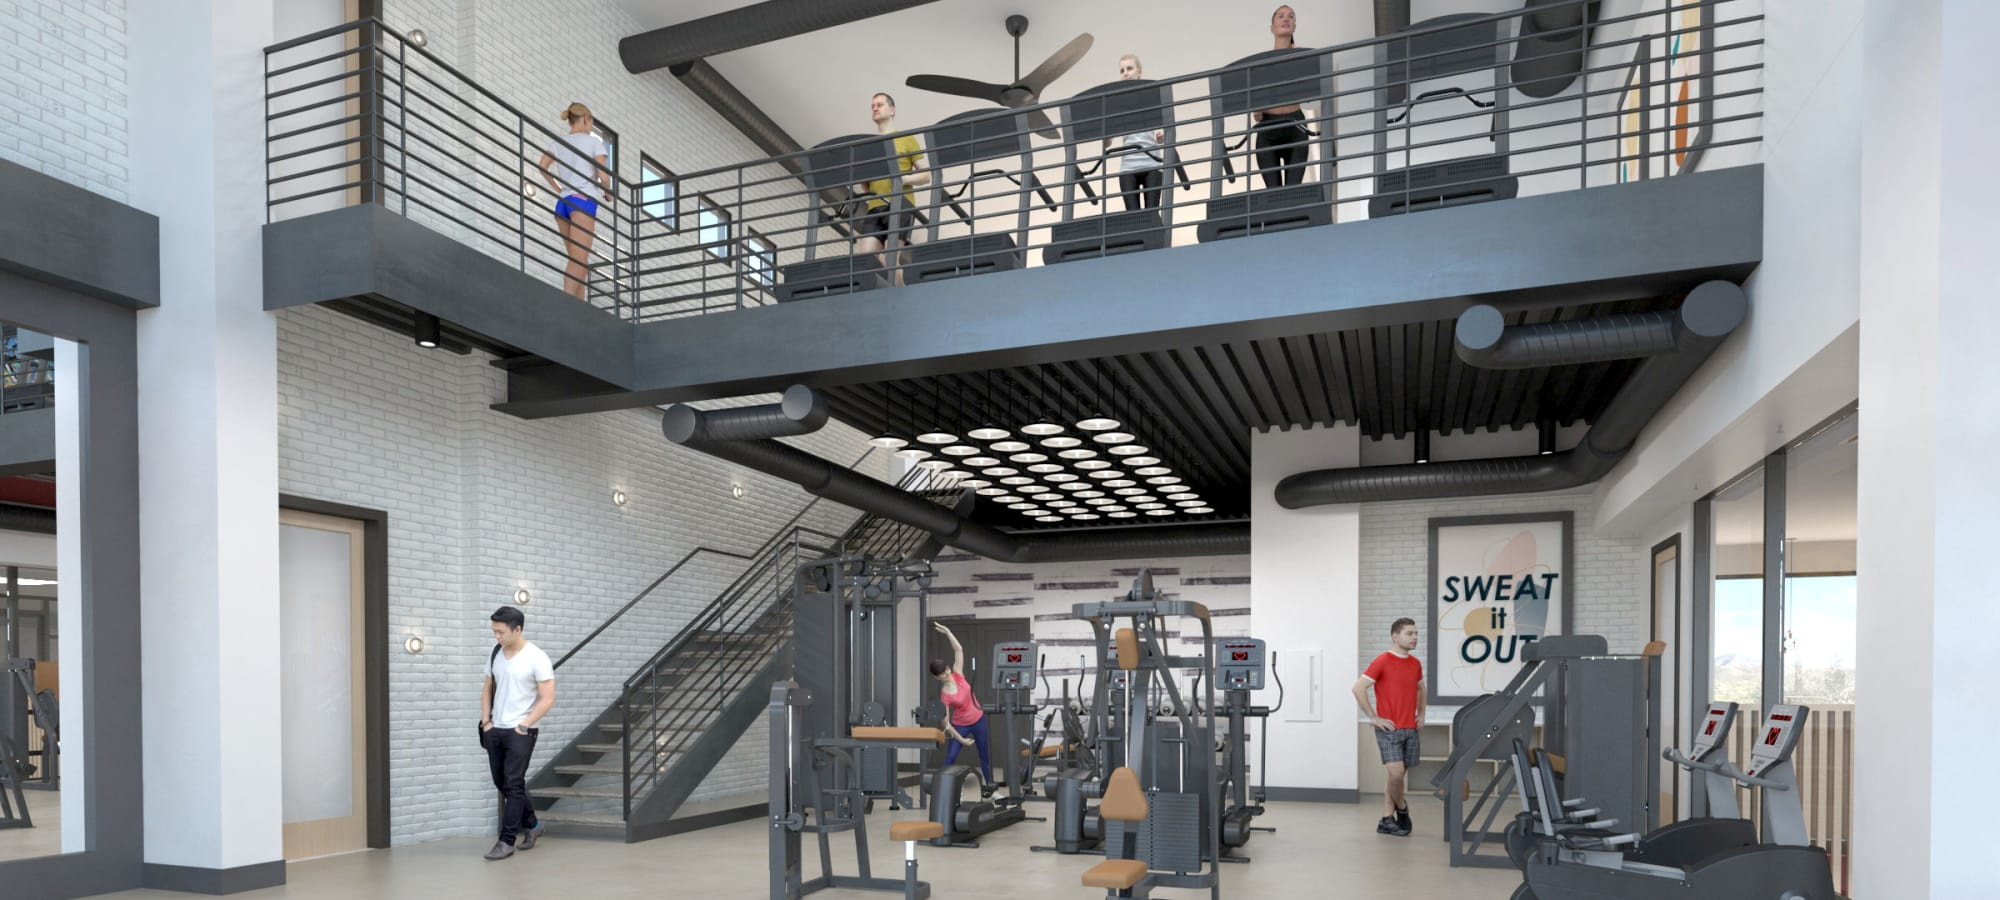 Rendering of fitness center at ArLo in Phoenix, Arizona